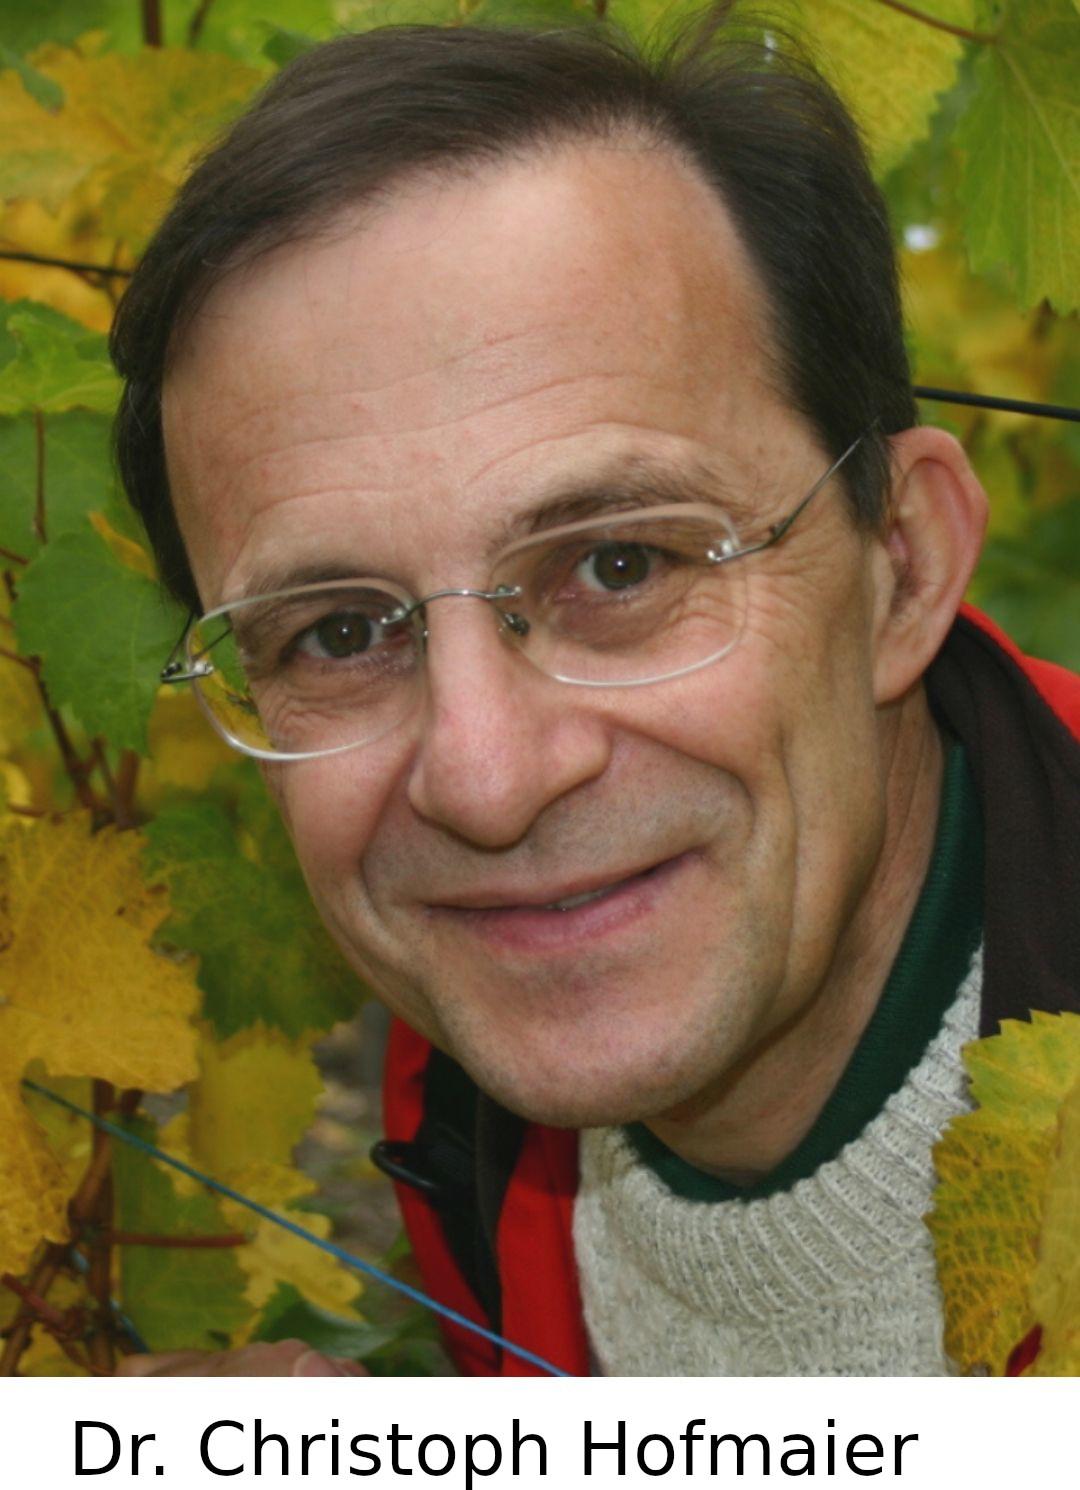 Dr. Christoph Hofmaier